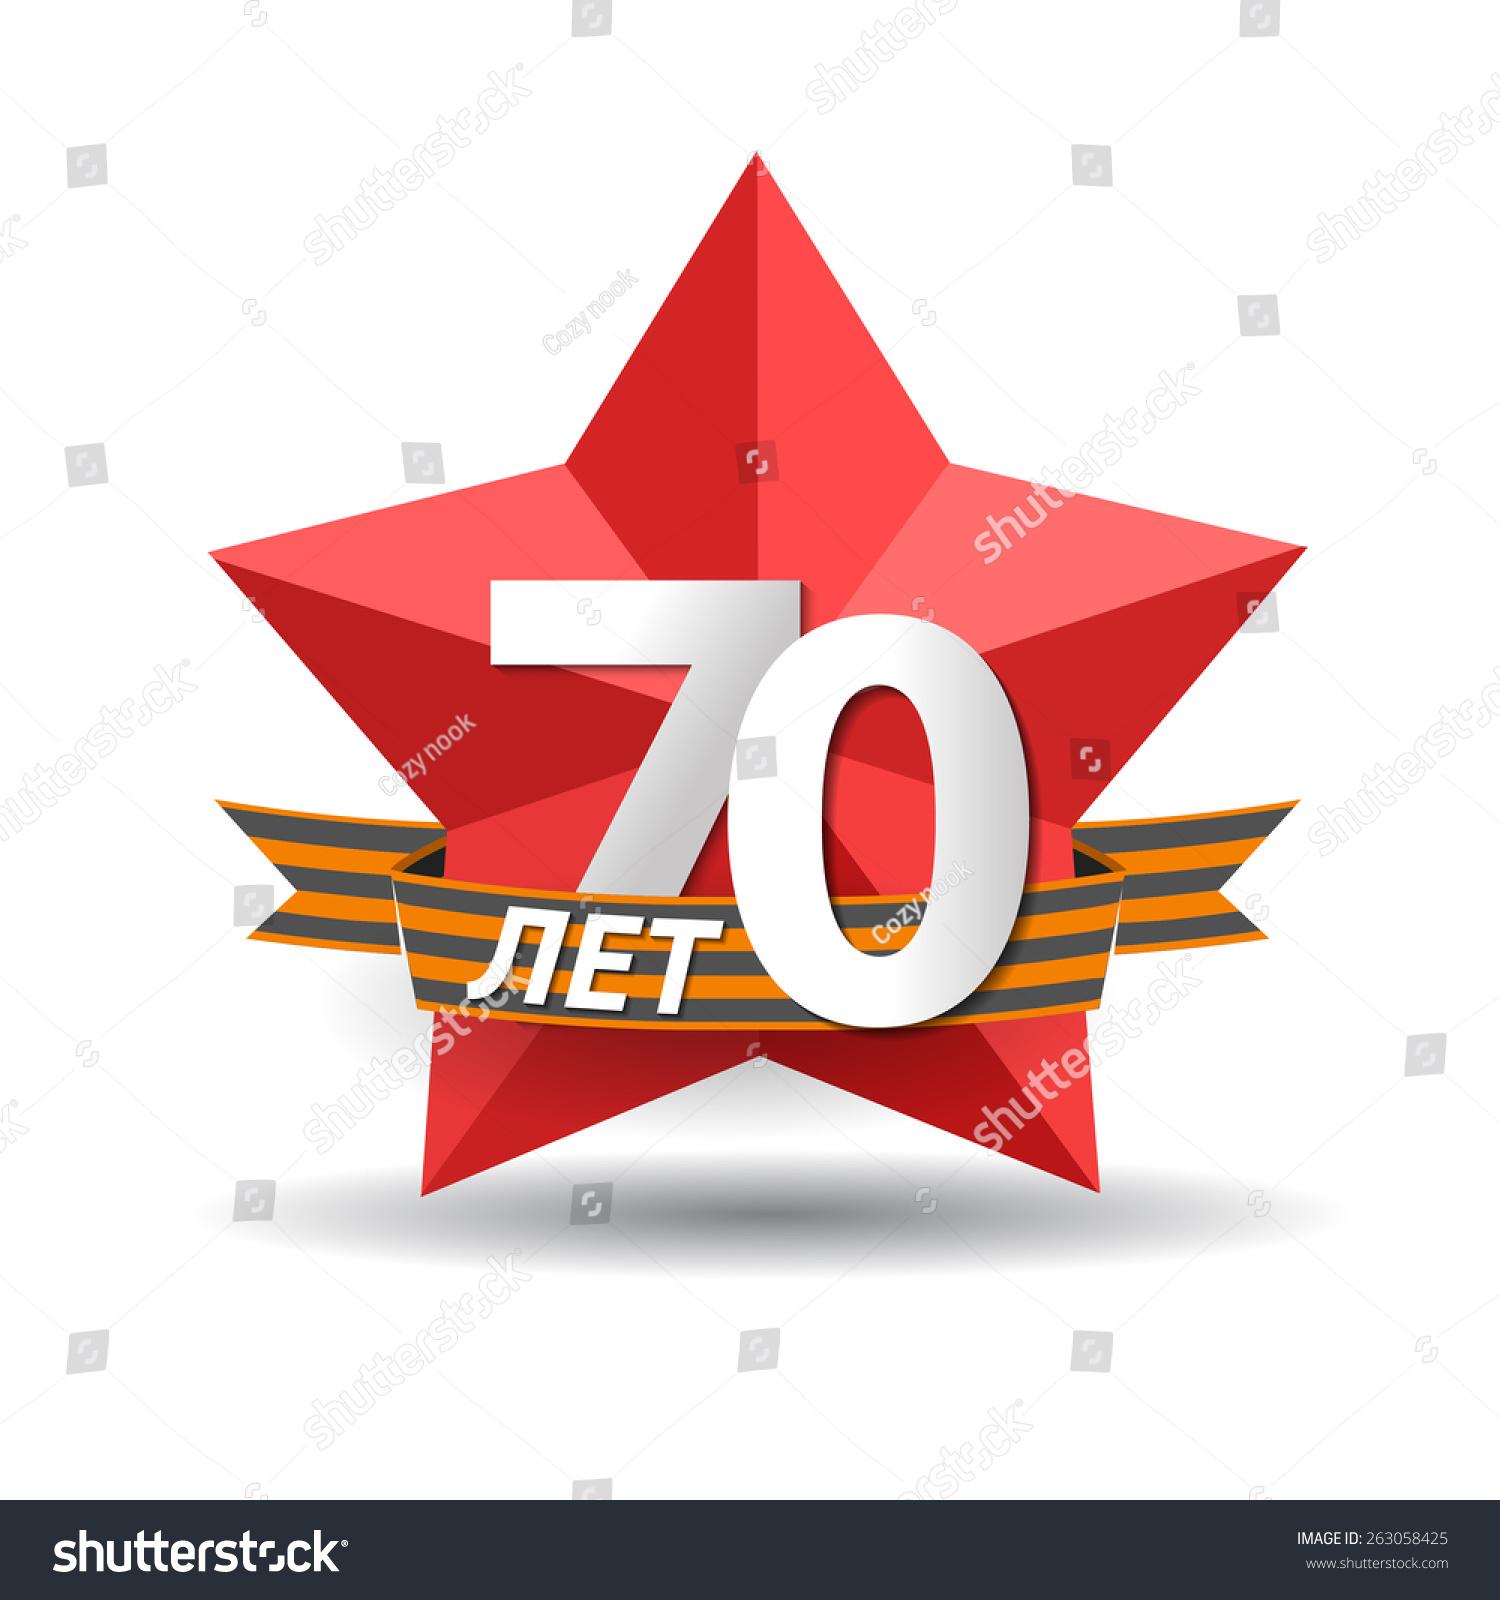 Holiday may victory day anniversary stock vector